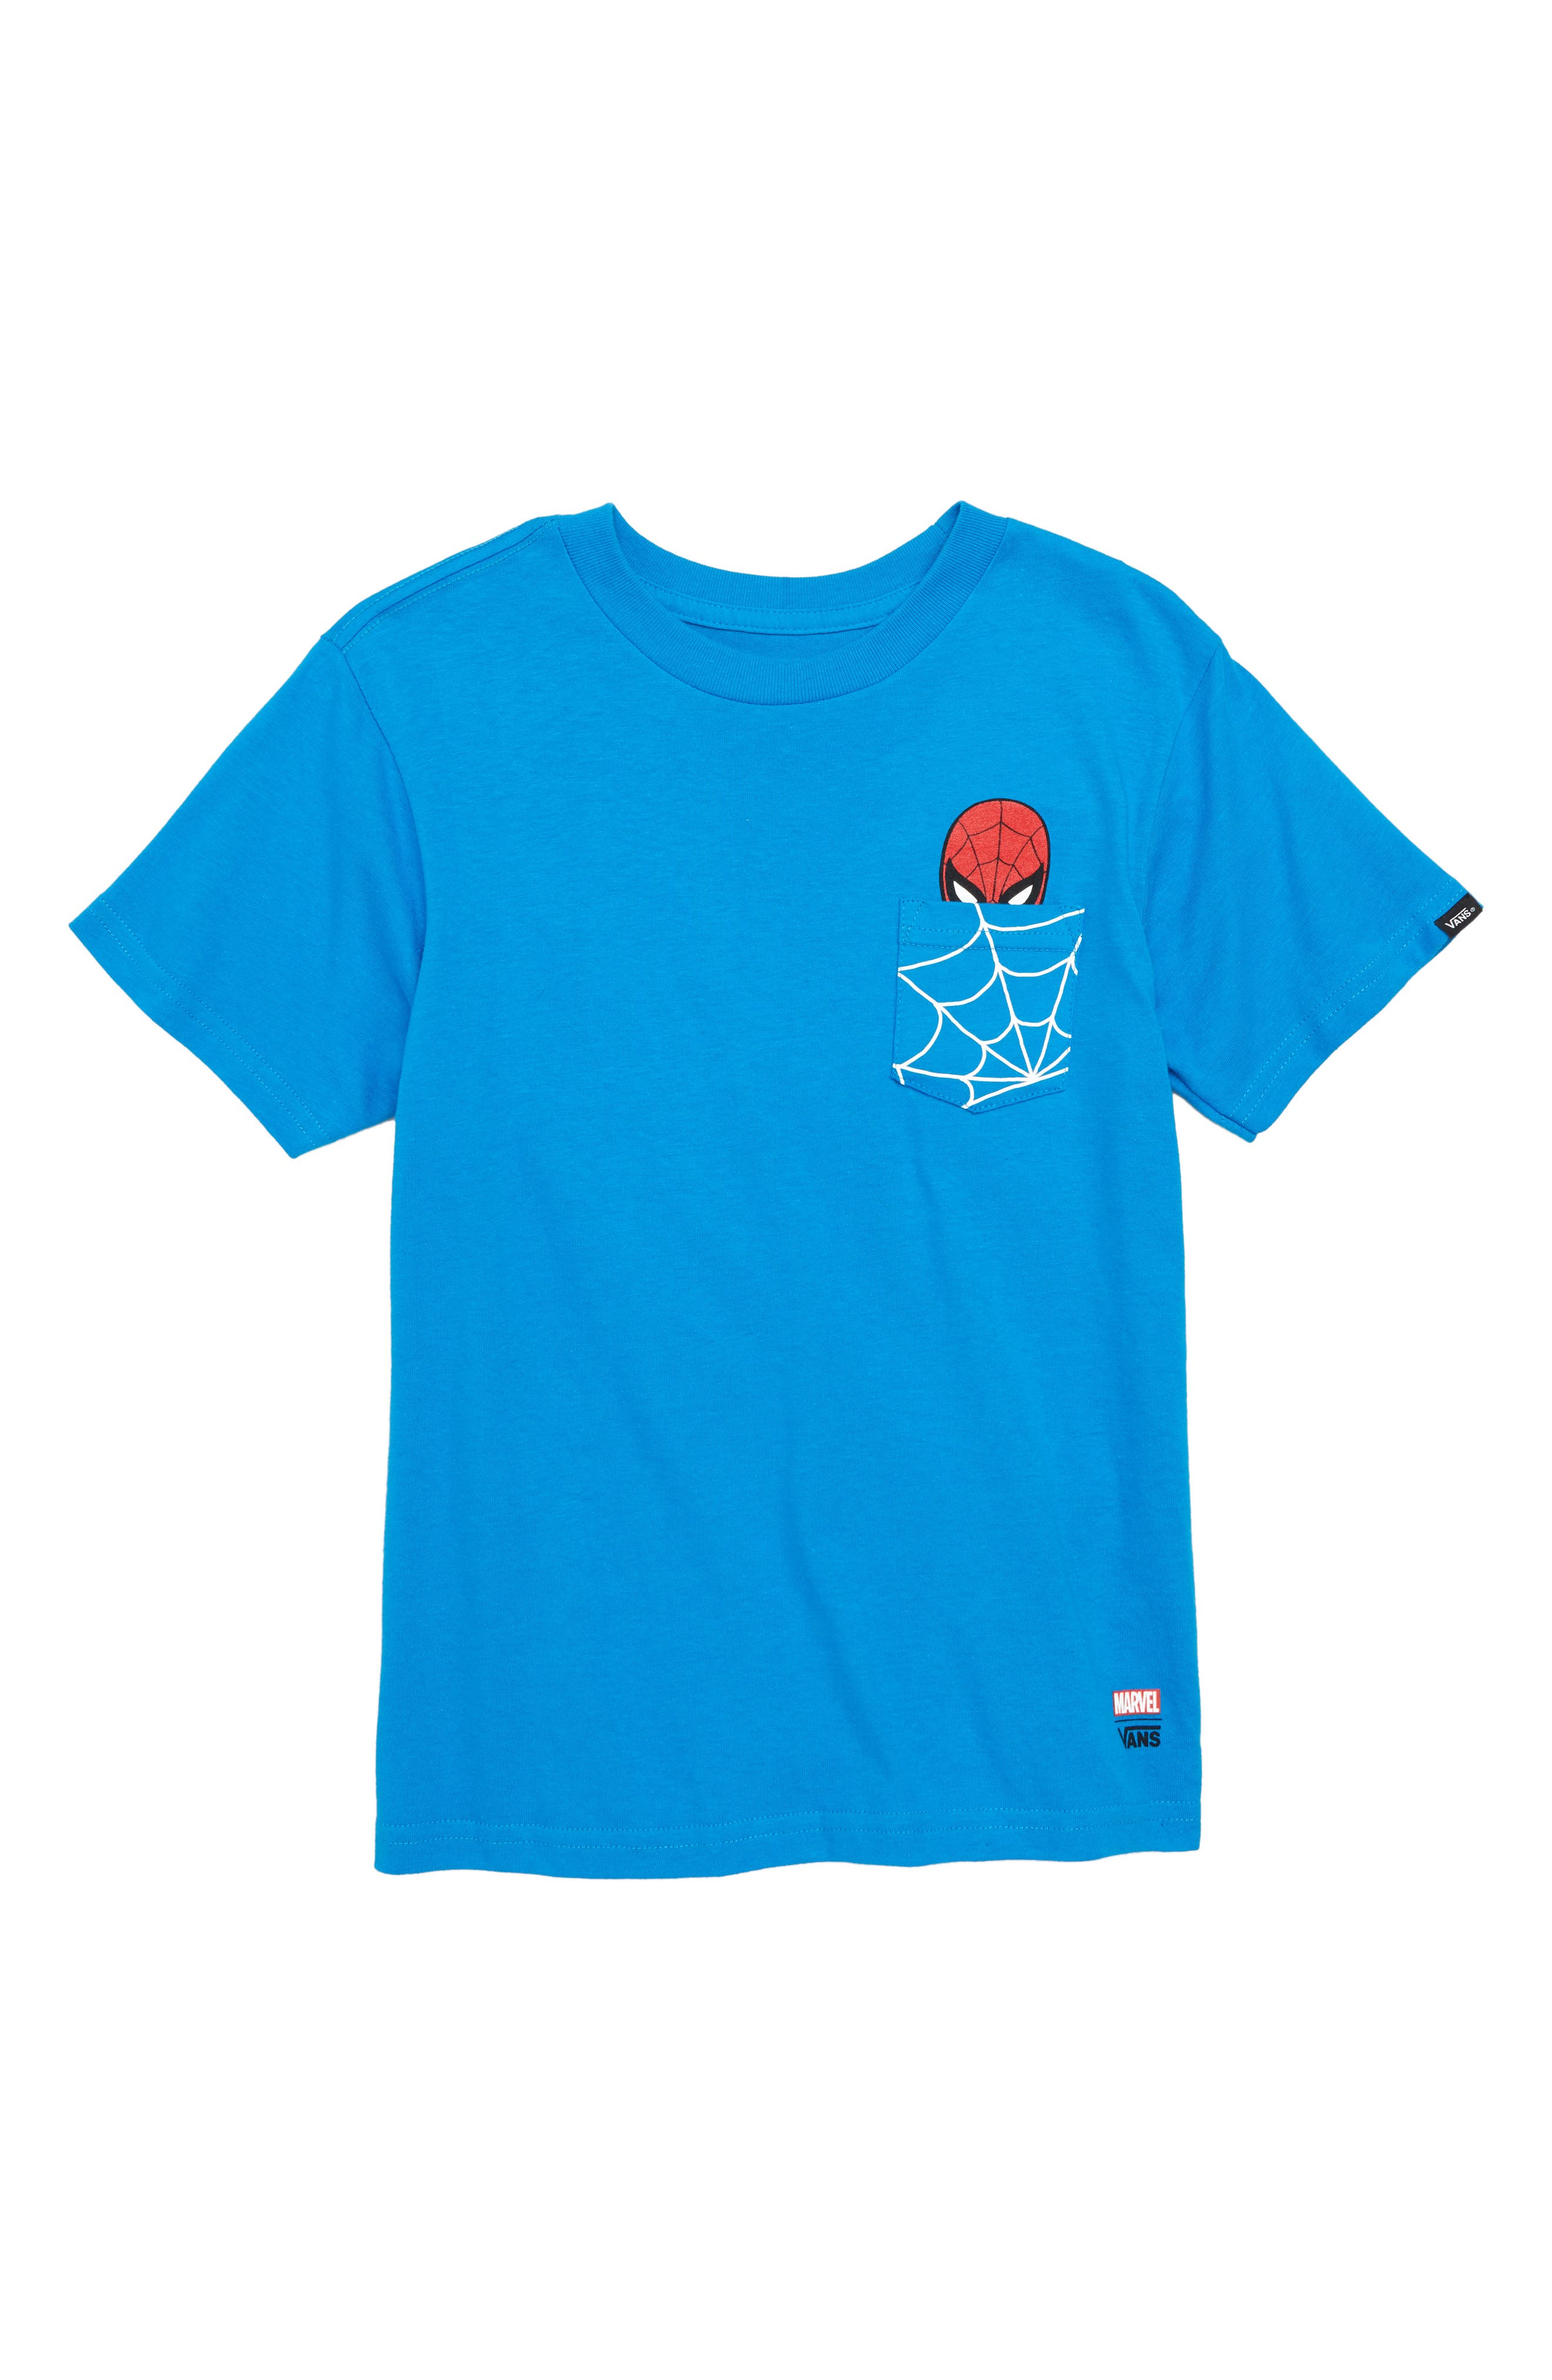 x Marvel<sup>®</sup> Avengers Spider-Man<sup>™</sup> Pocket T-Shirt,                         Main,                         color, Blue